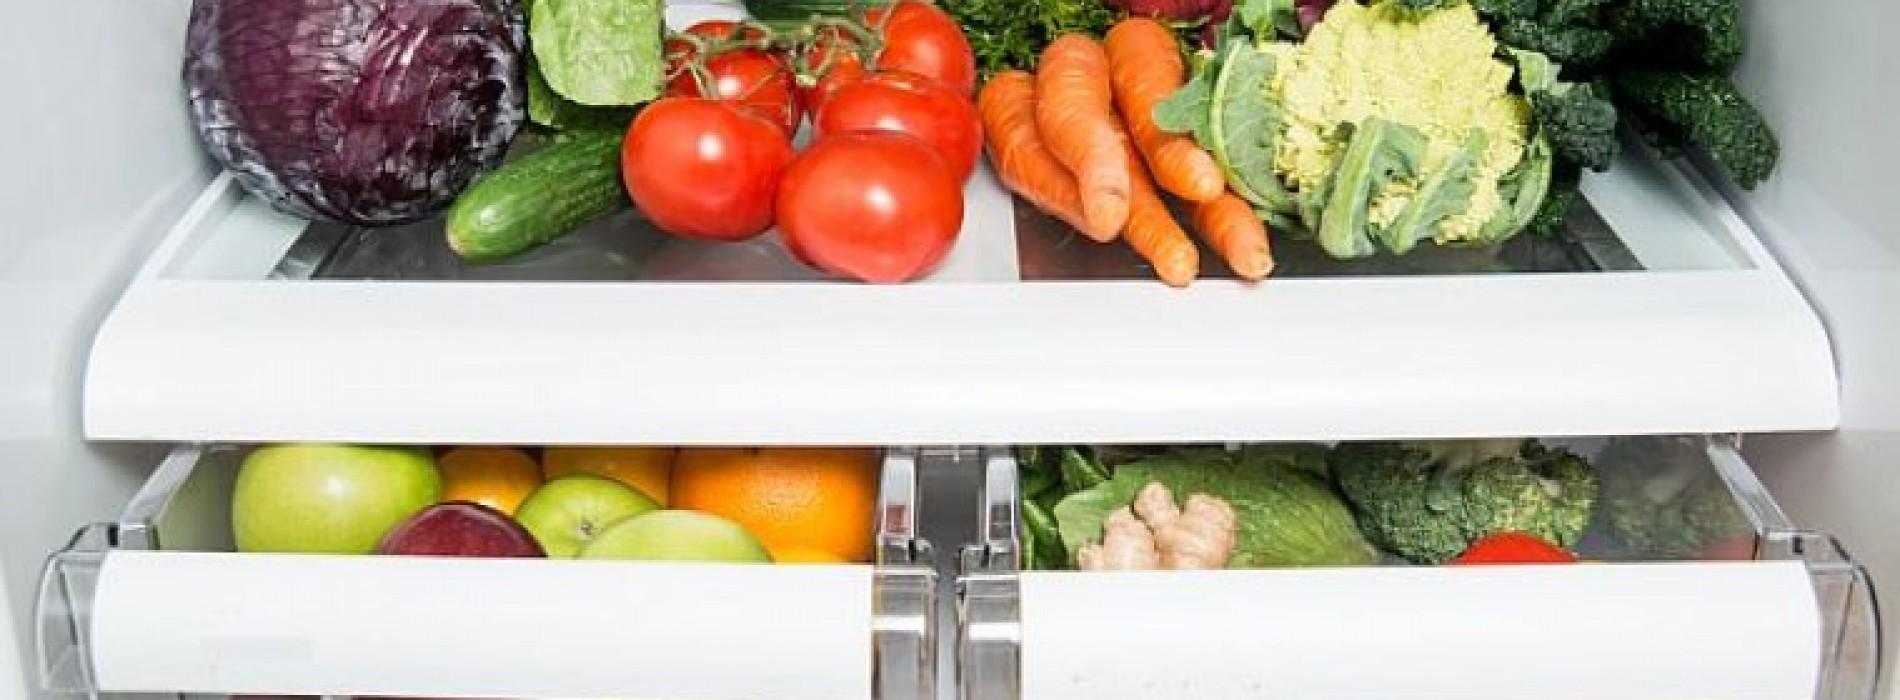 Fruit en groente in de frigo: hou ze gescheiden!